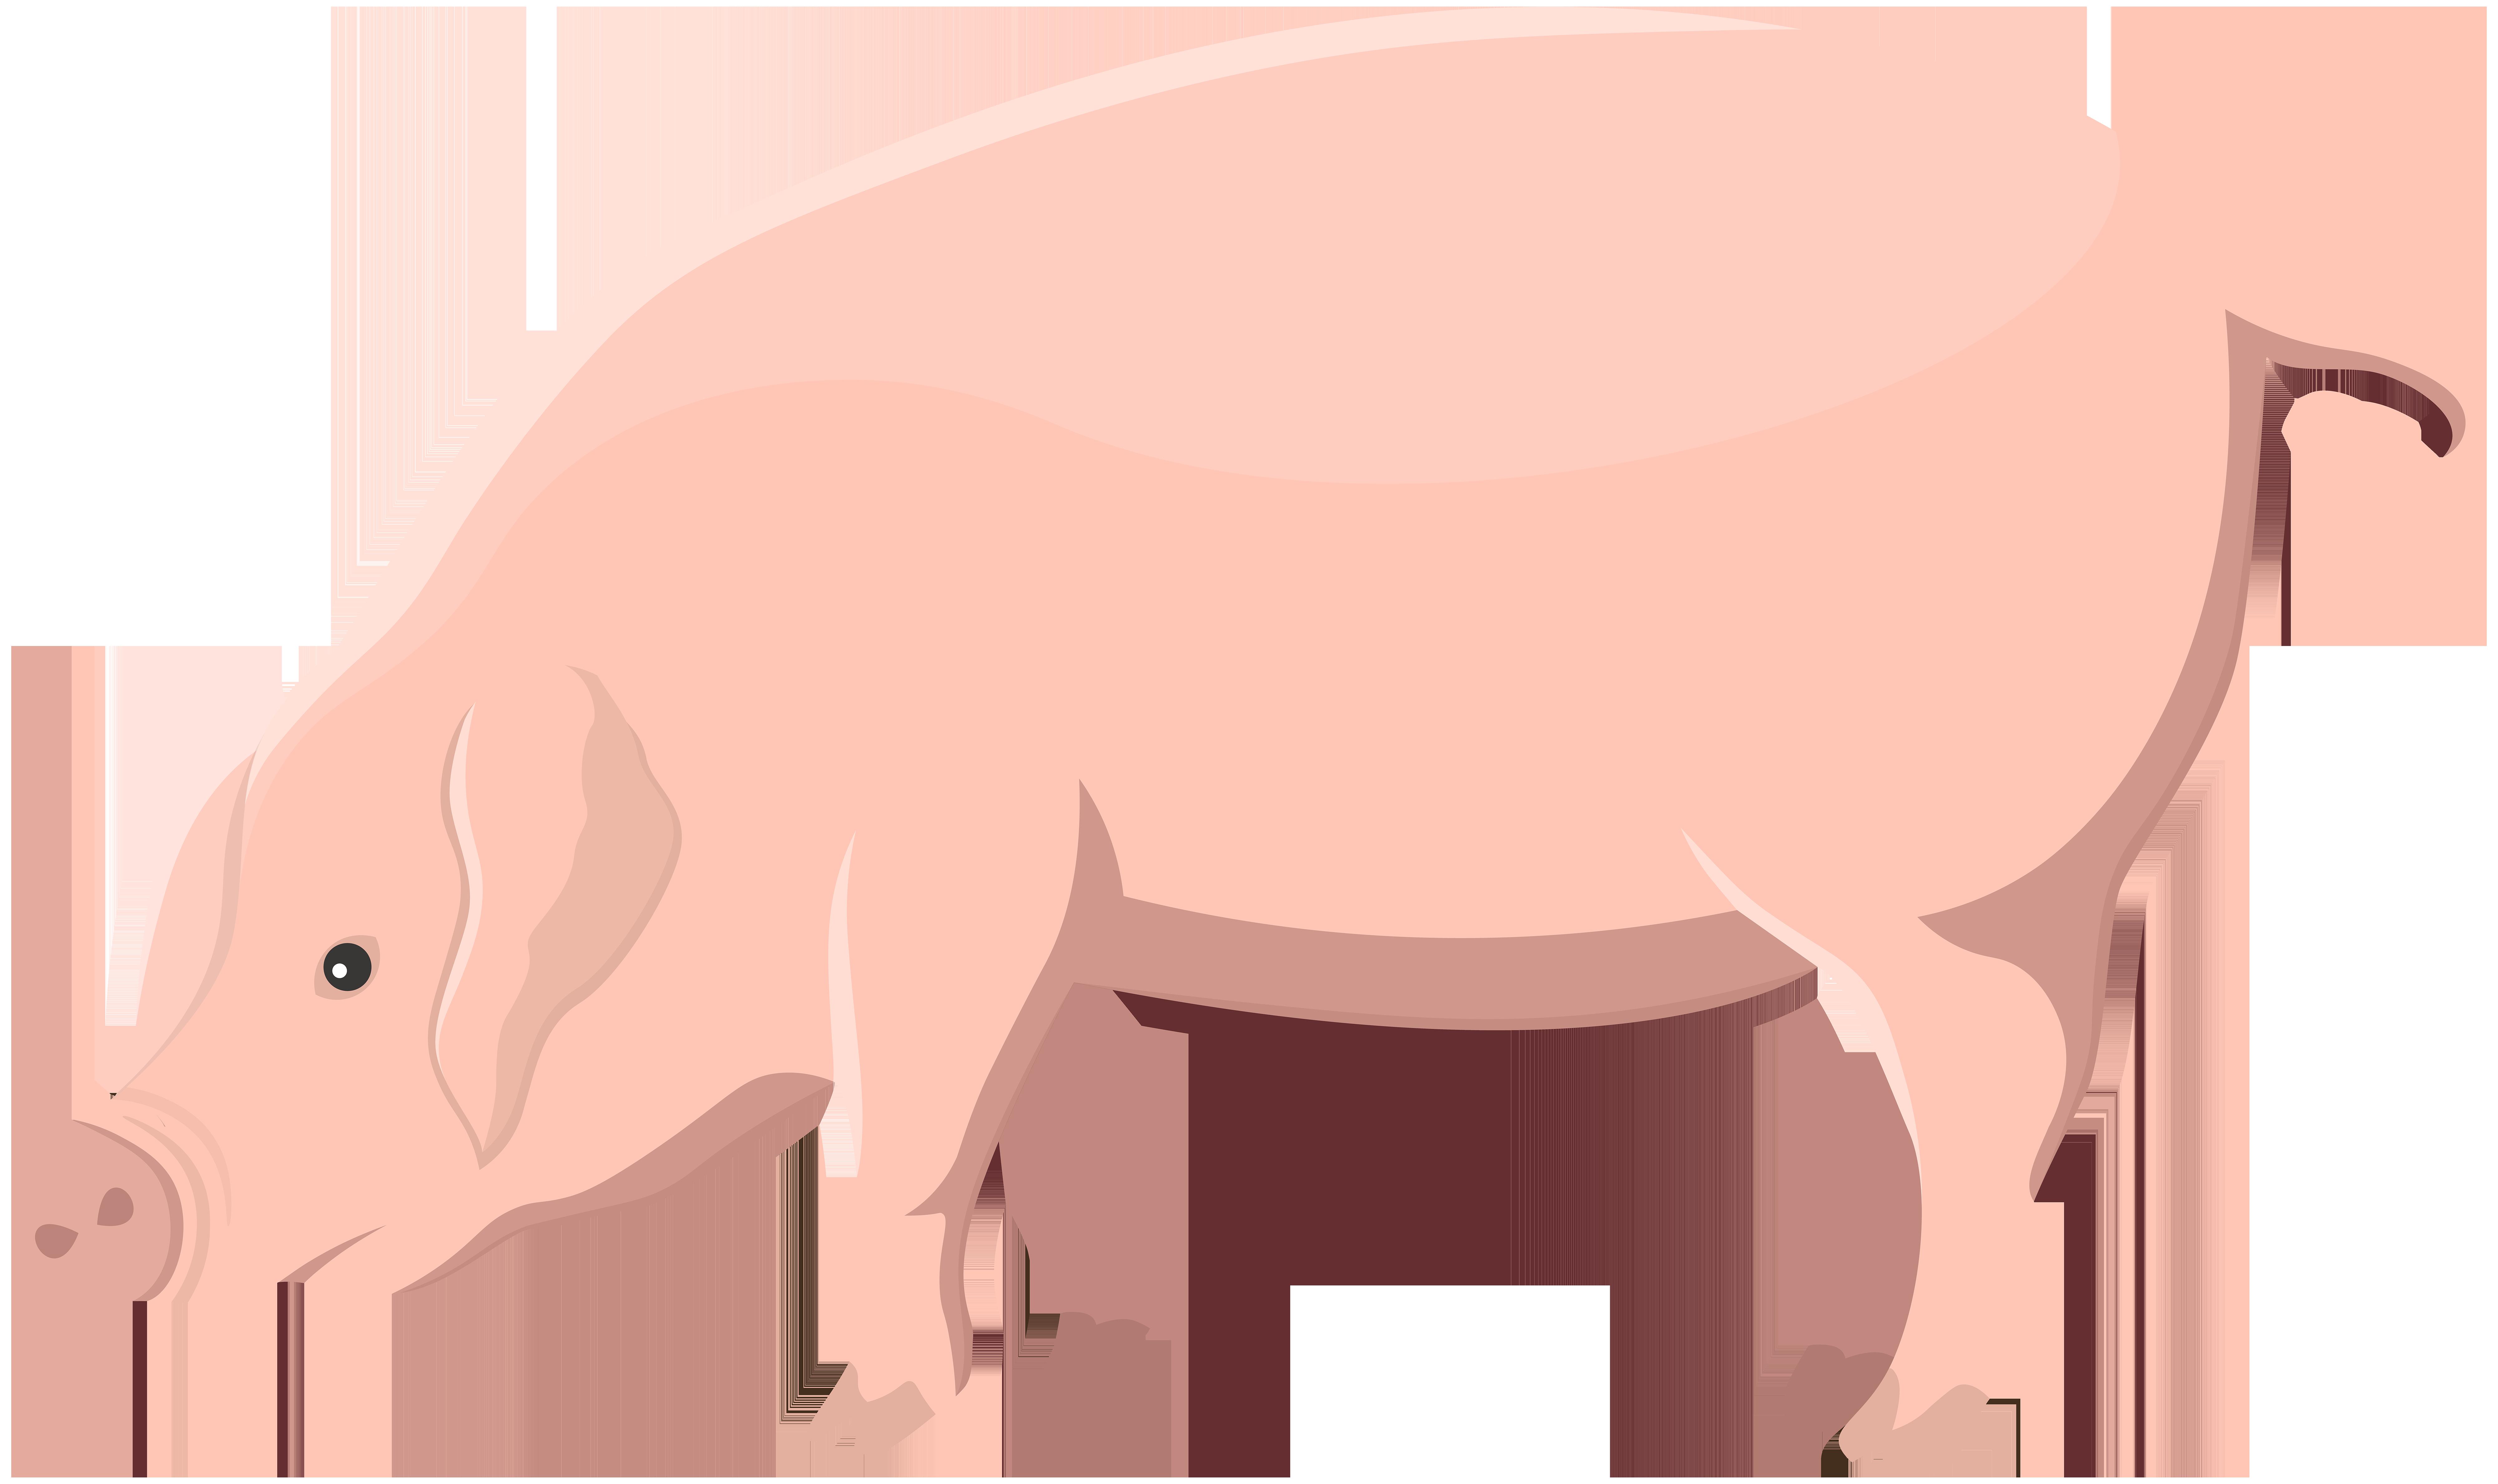 Transparent clip art image. Clipart pig beach